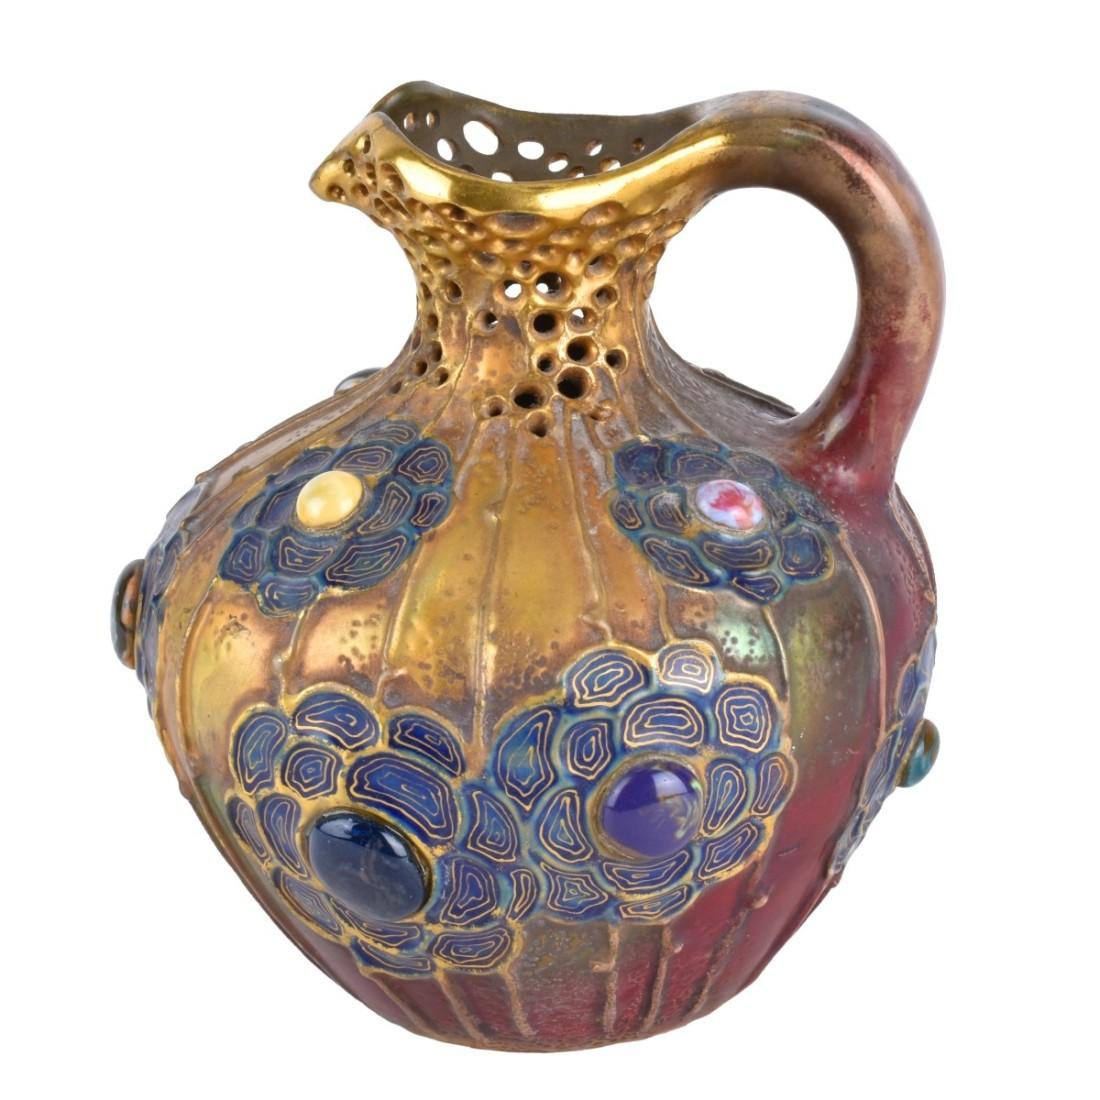 Gres Bijou pottery ewer. Numbered 3855/45 to base.